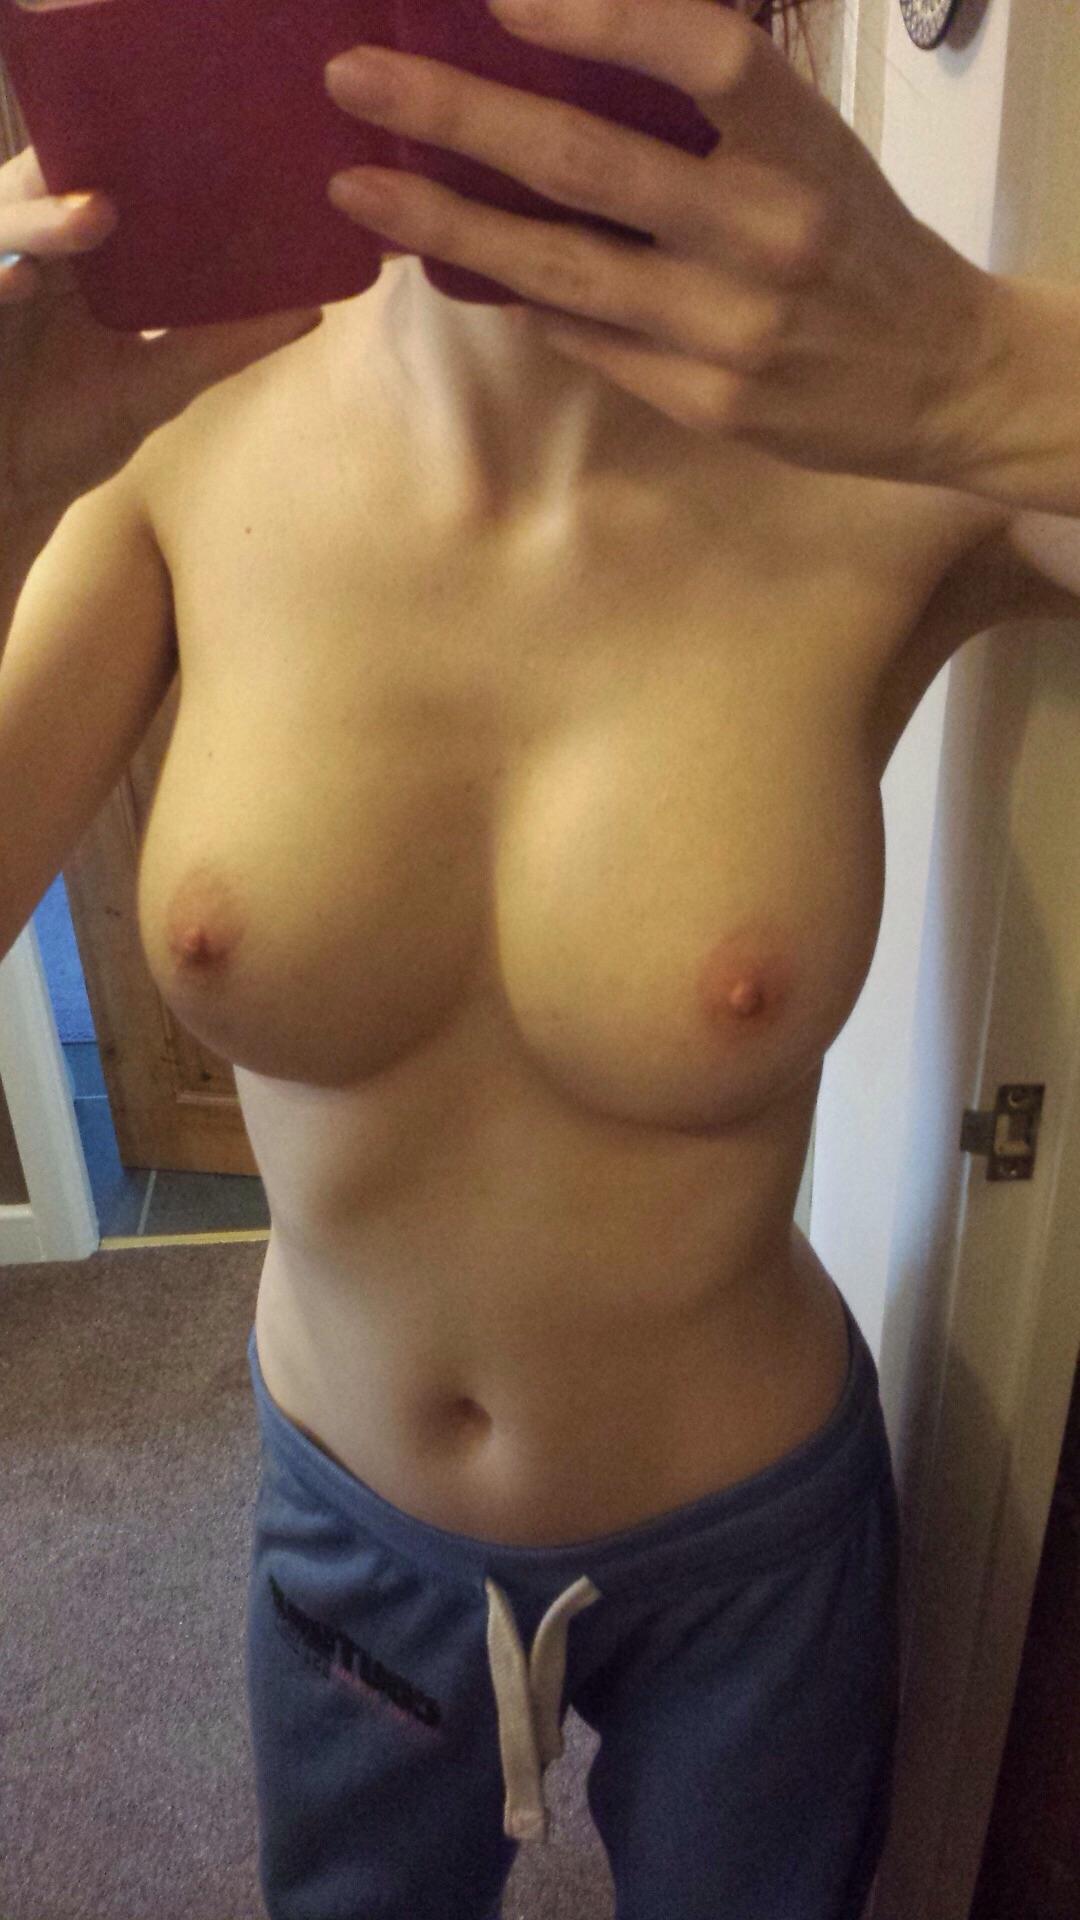 Teresa willis nude clip